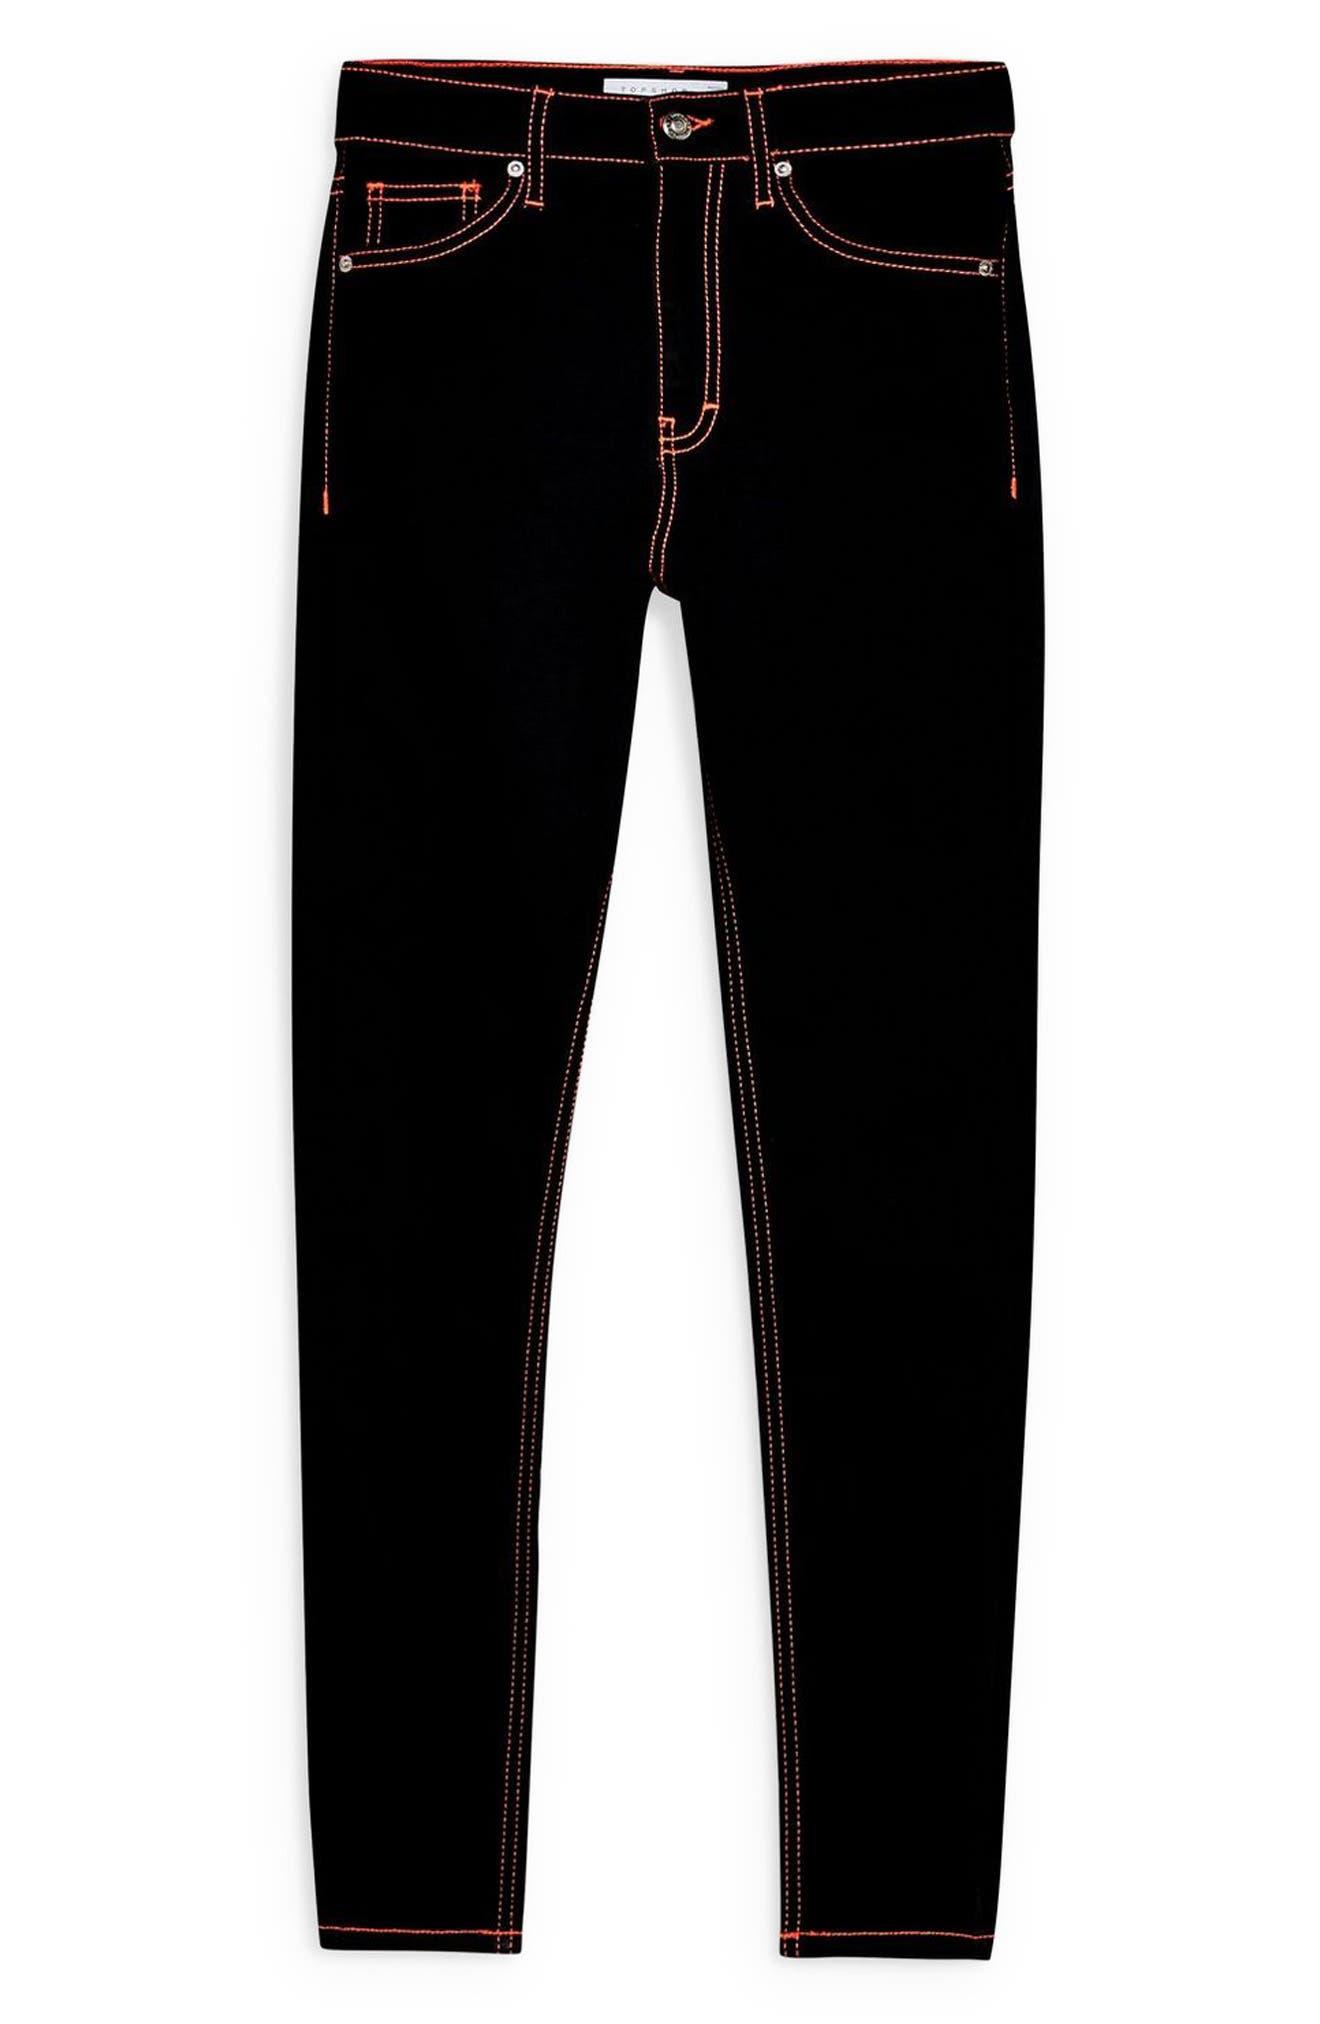 TOPSHOP, Jamie Neon Stitch High Waist Ankle Skinny Jeans, Alternate thumbnail 4, color, BLACK MULTI